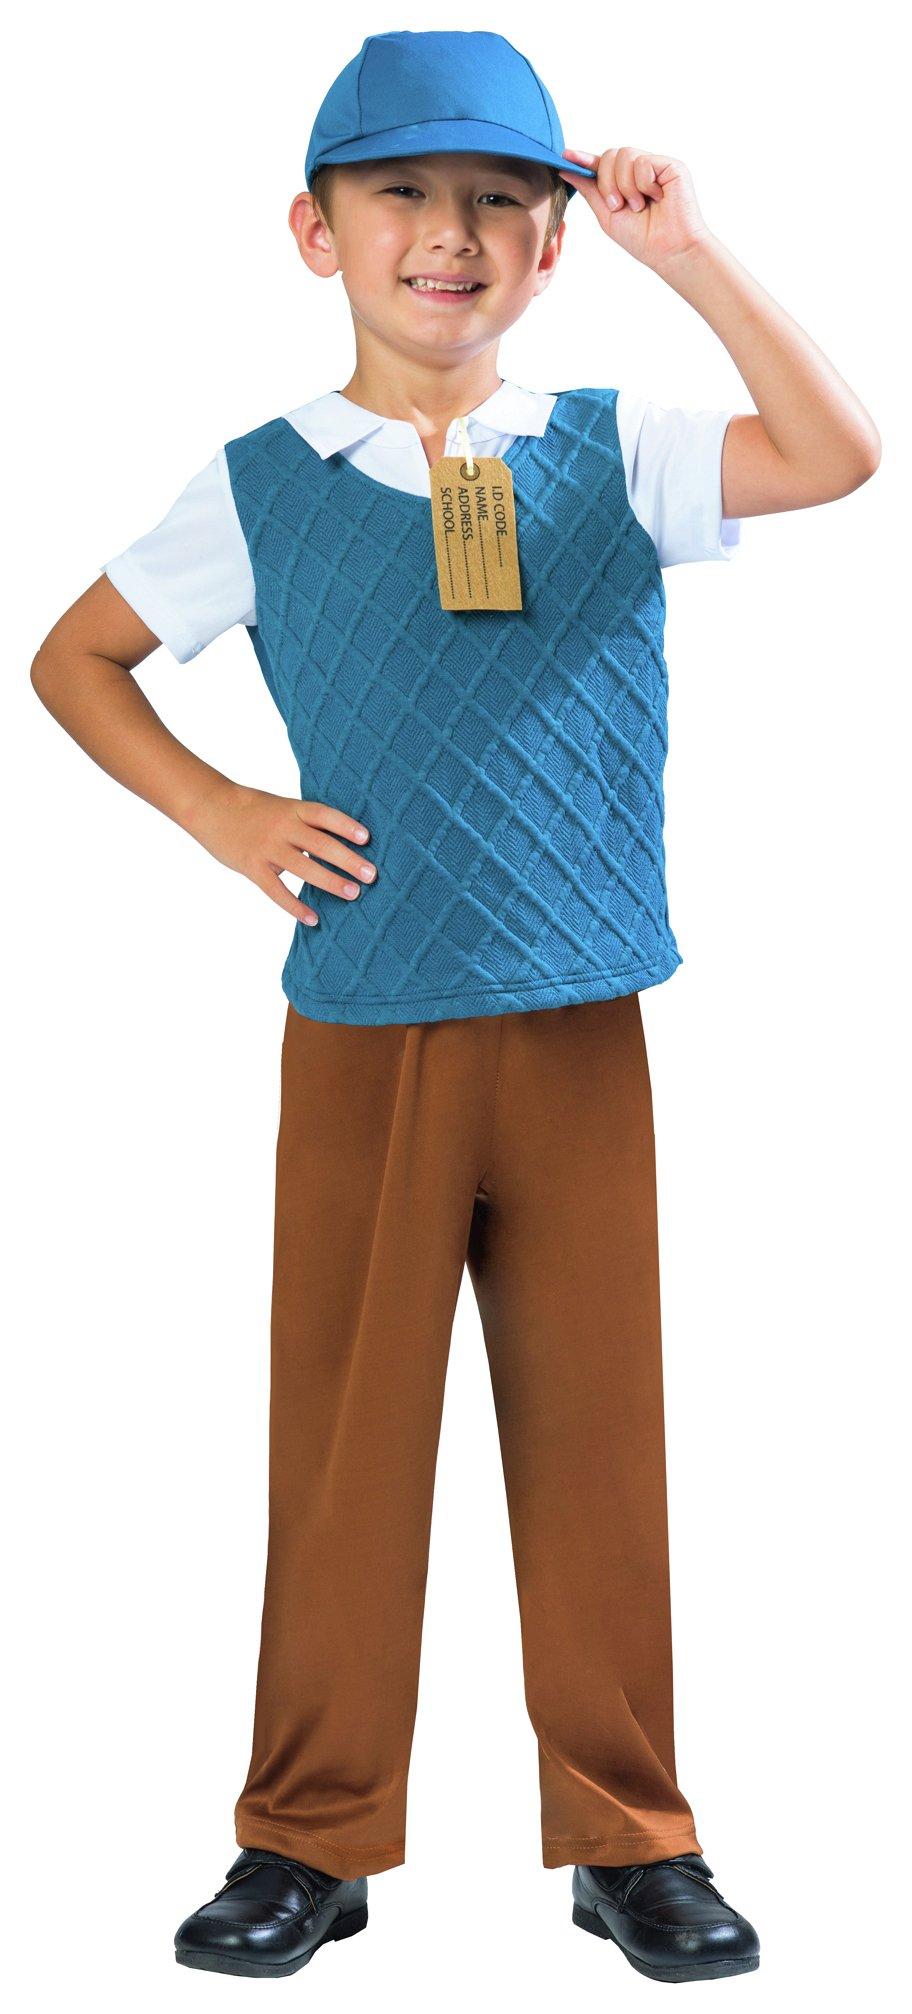 Image of Amscan Evacuee Boy Costume - 7 - 8 Years.